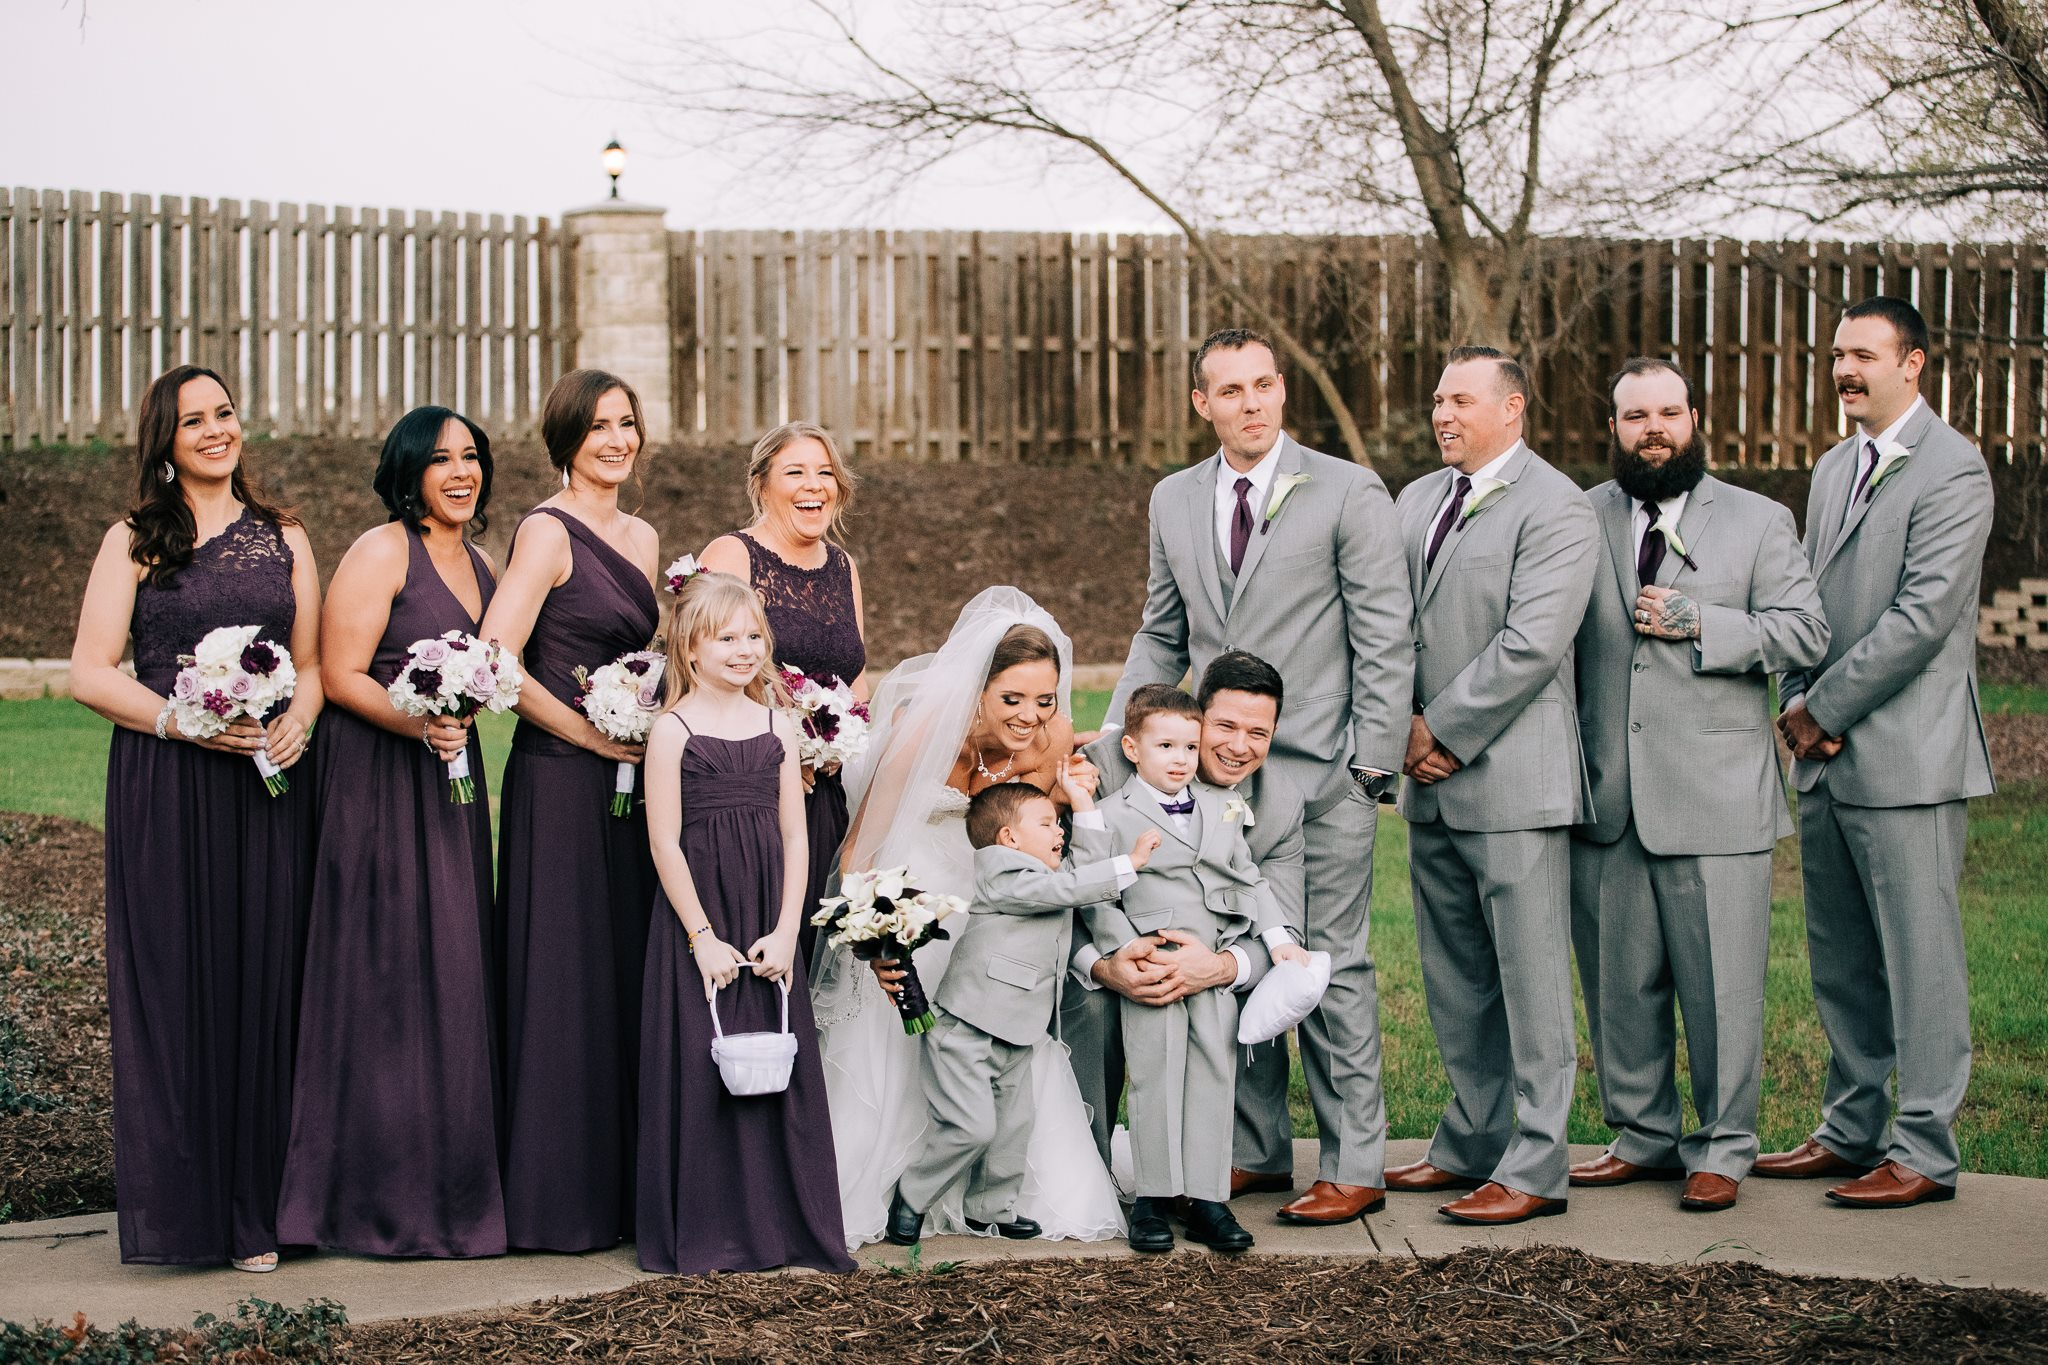 Aubrey-Texas-Harmony-Chapel-Wedding-Florist-David-Co.-13.jpg